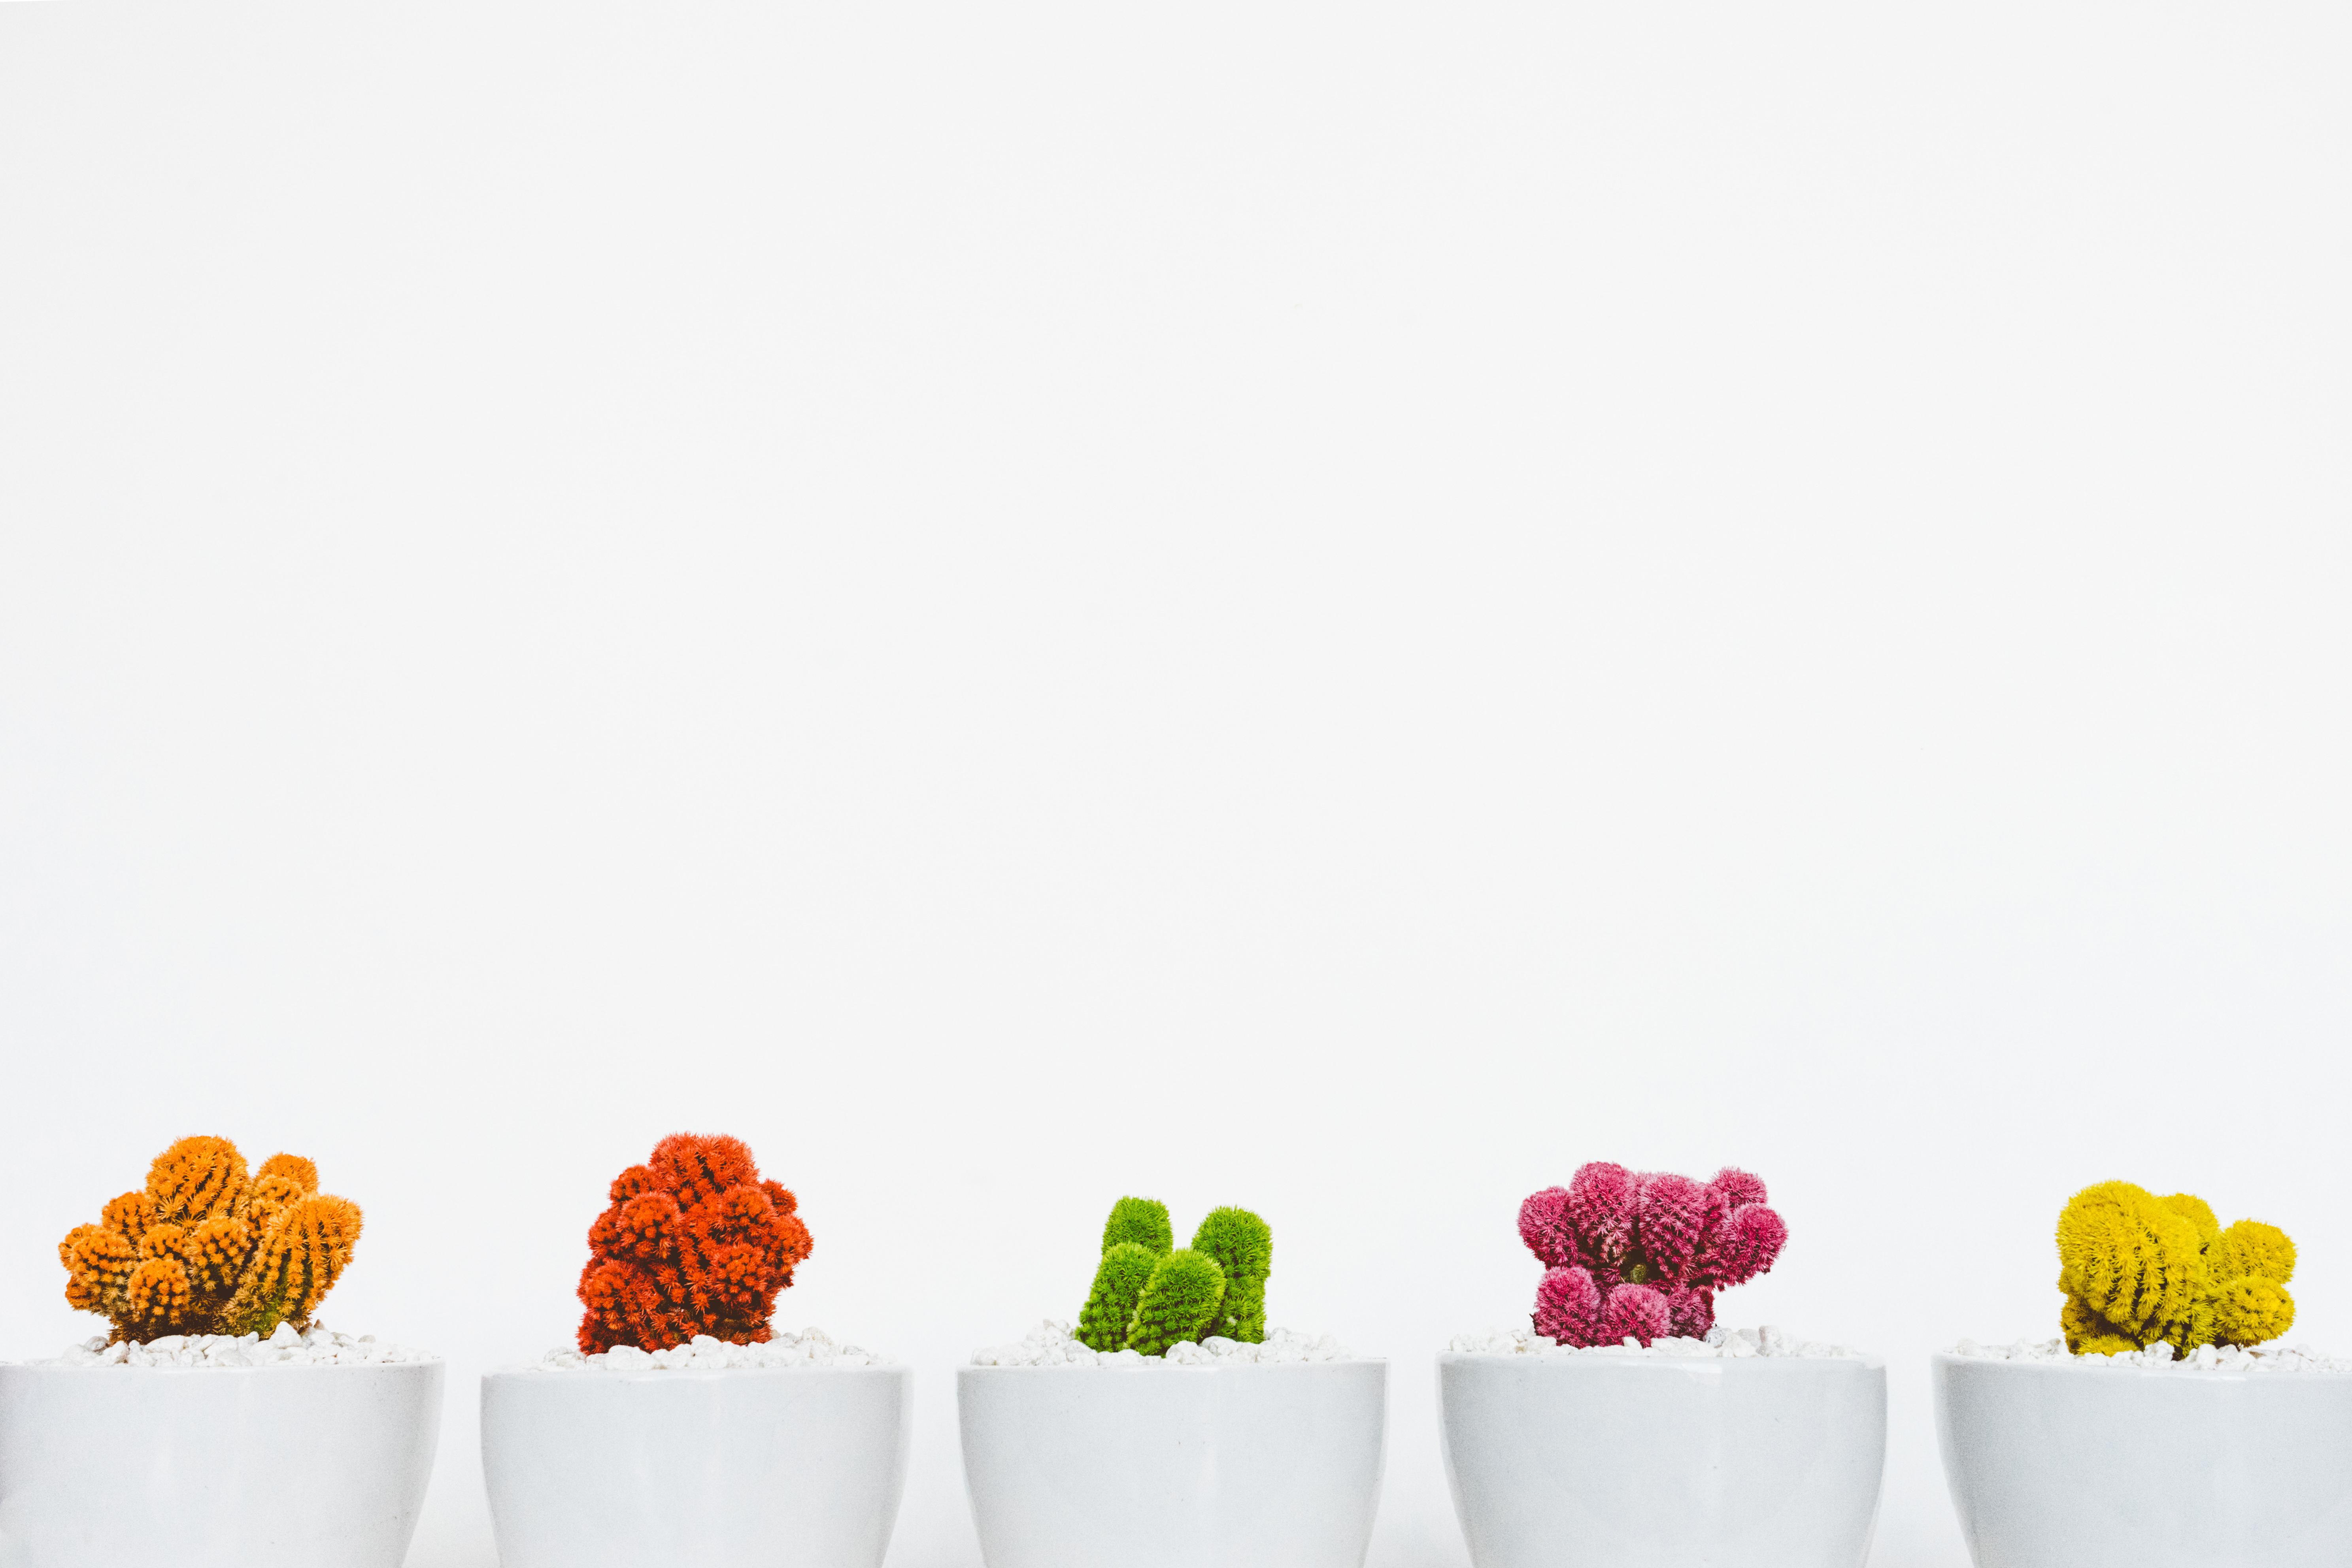 Gambar Kaktus Menanam Daun Bunga Pola Warna Kuning Pot